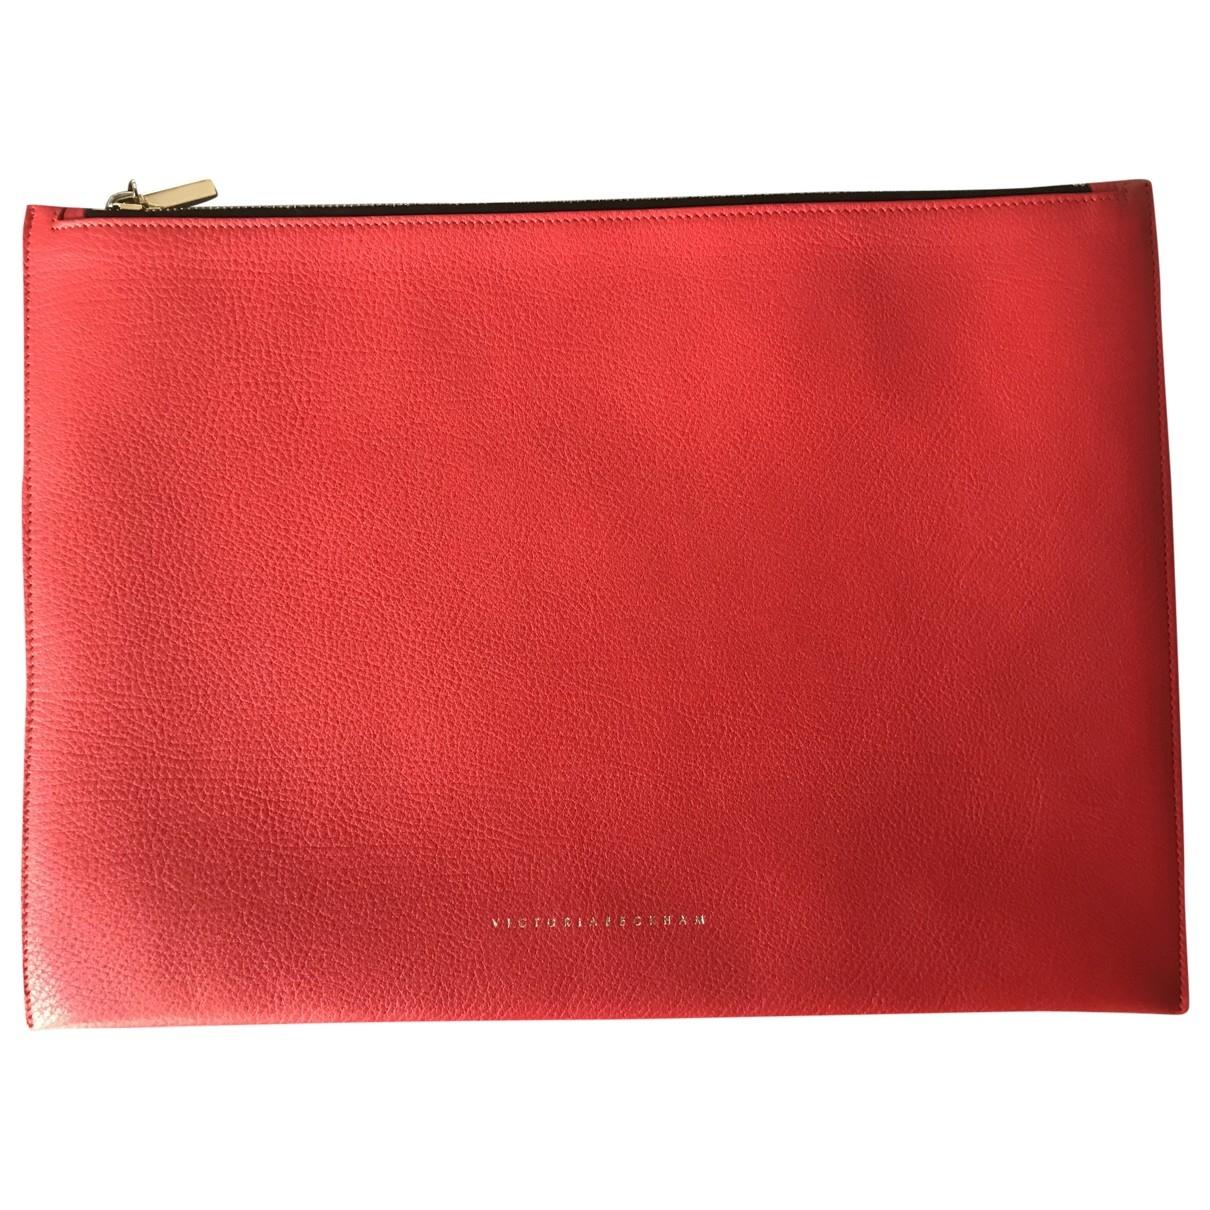 Victoria Beckham \N Clutch in  Rot Leder